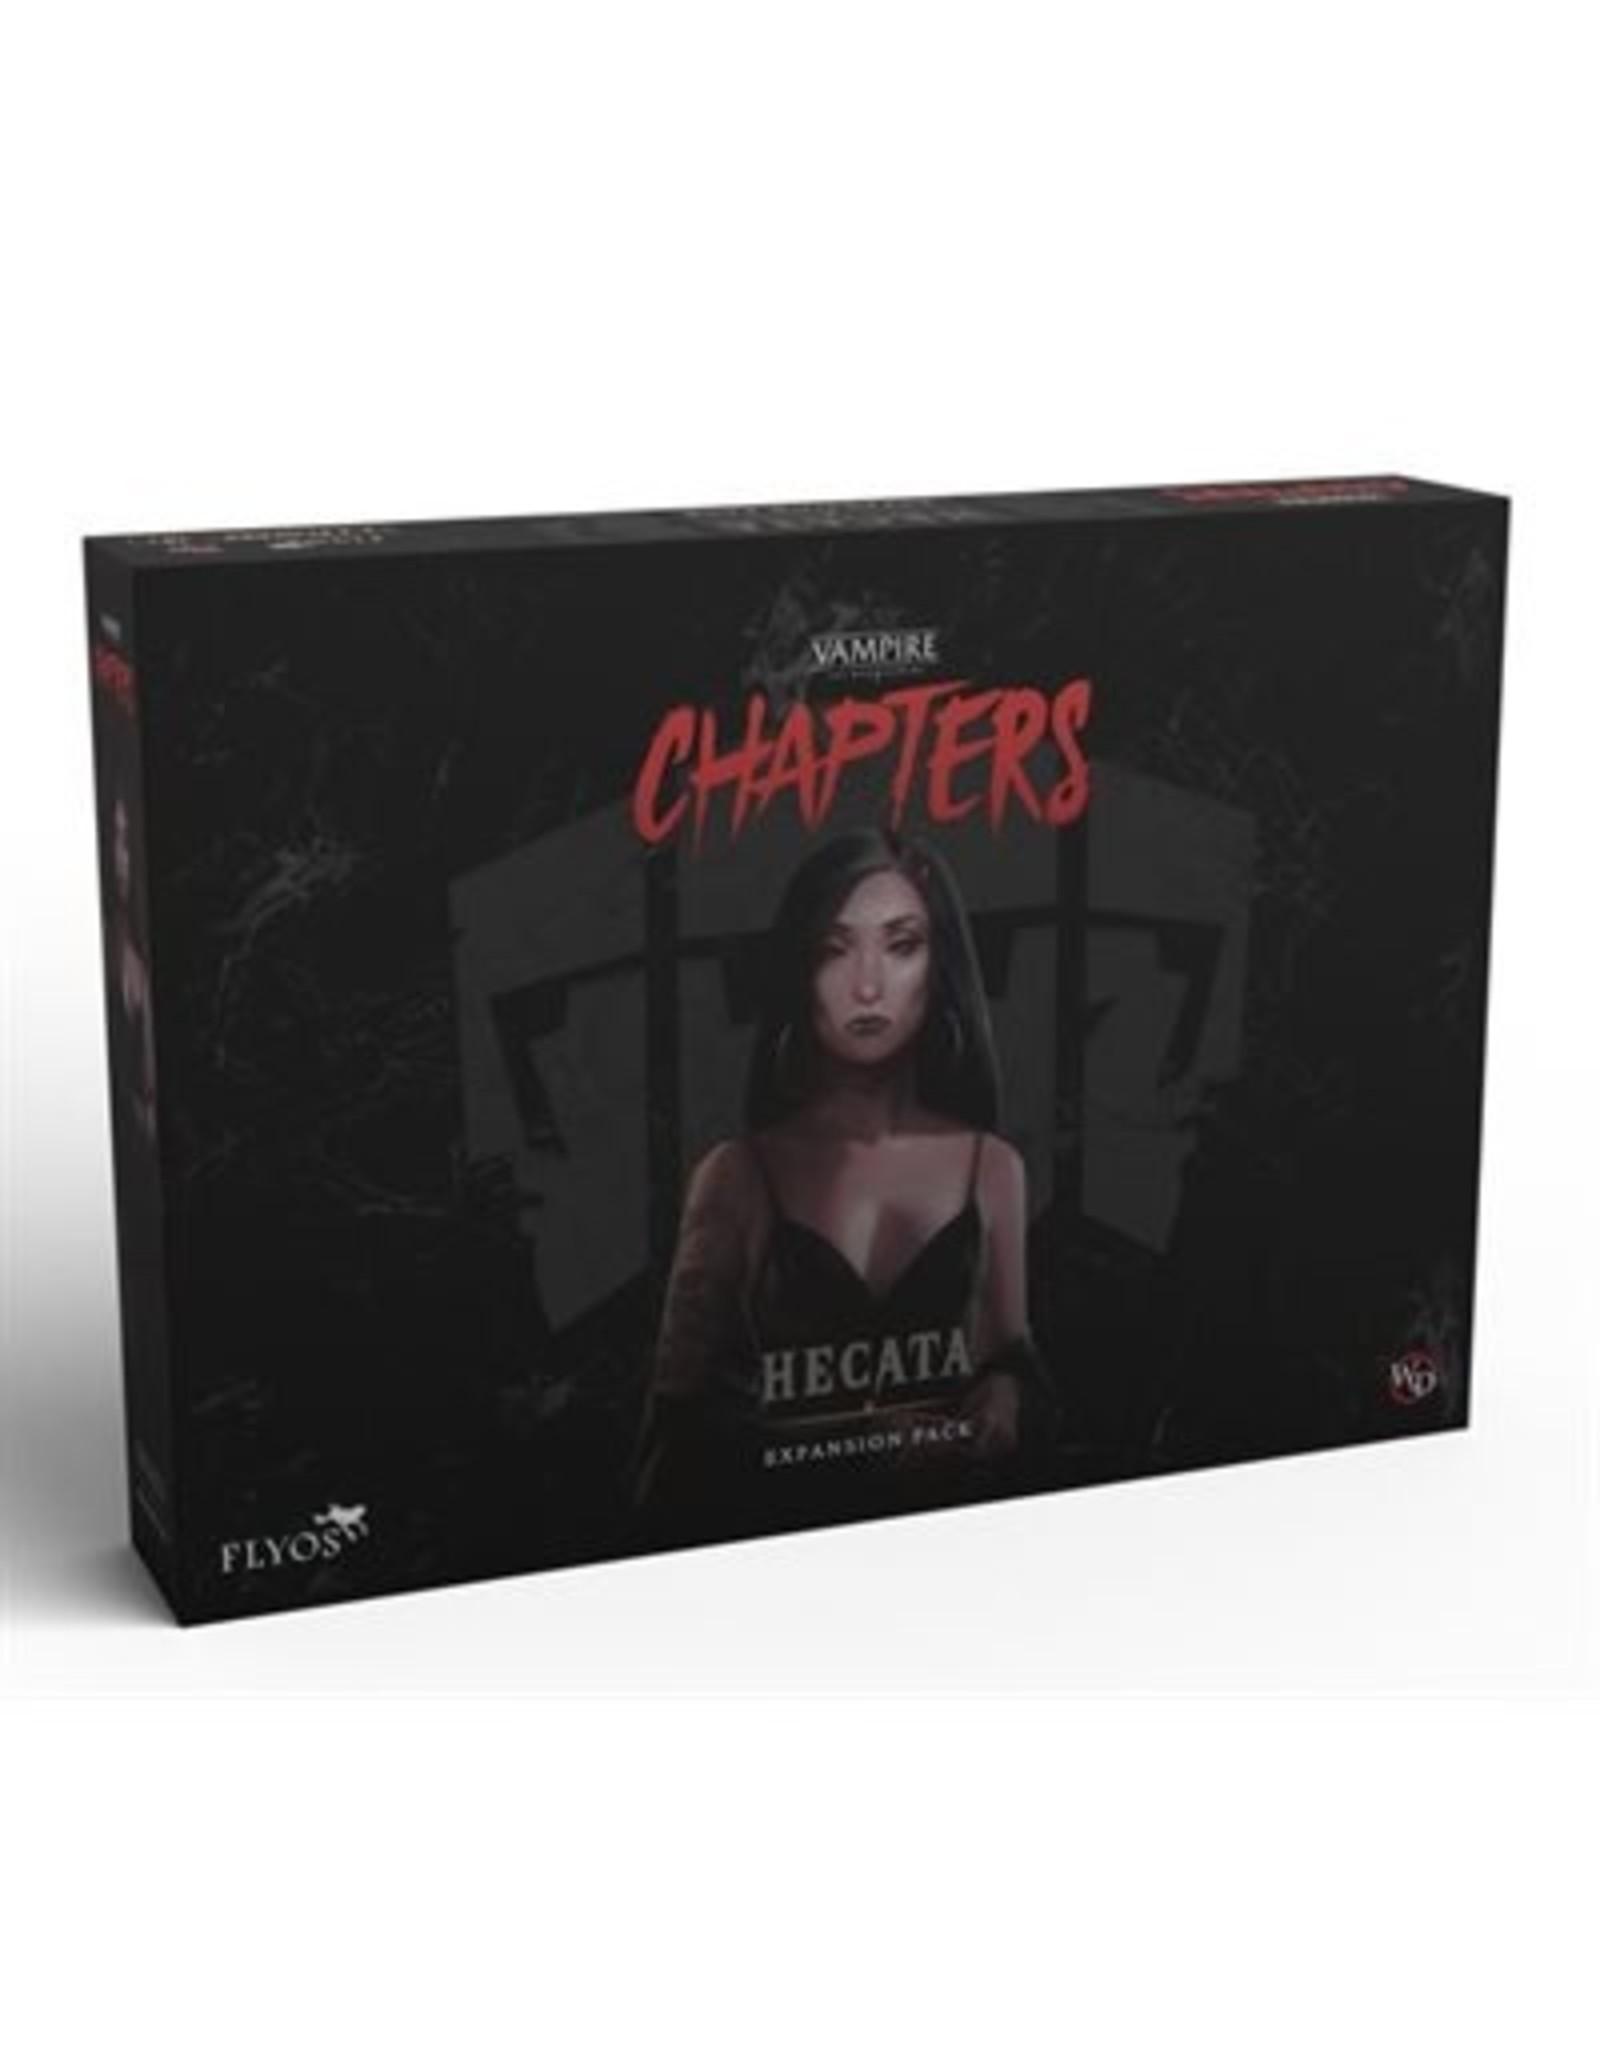 Flyos Vampire the Masquerade: Chapters: Hecata The Huntress (Pre Order) (May 2022)